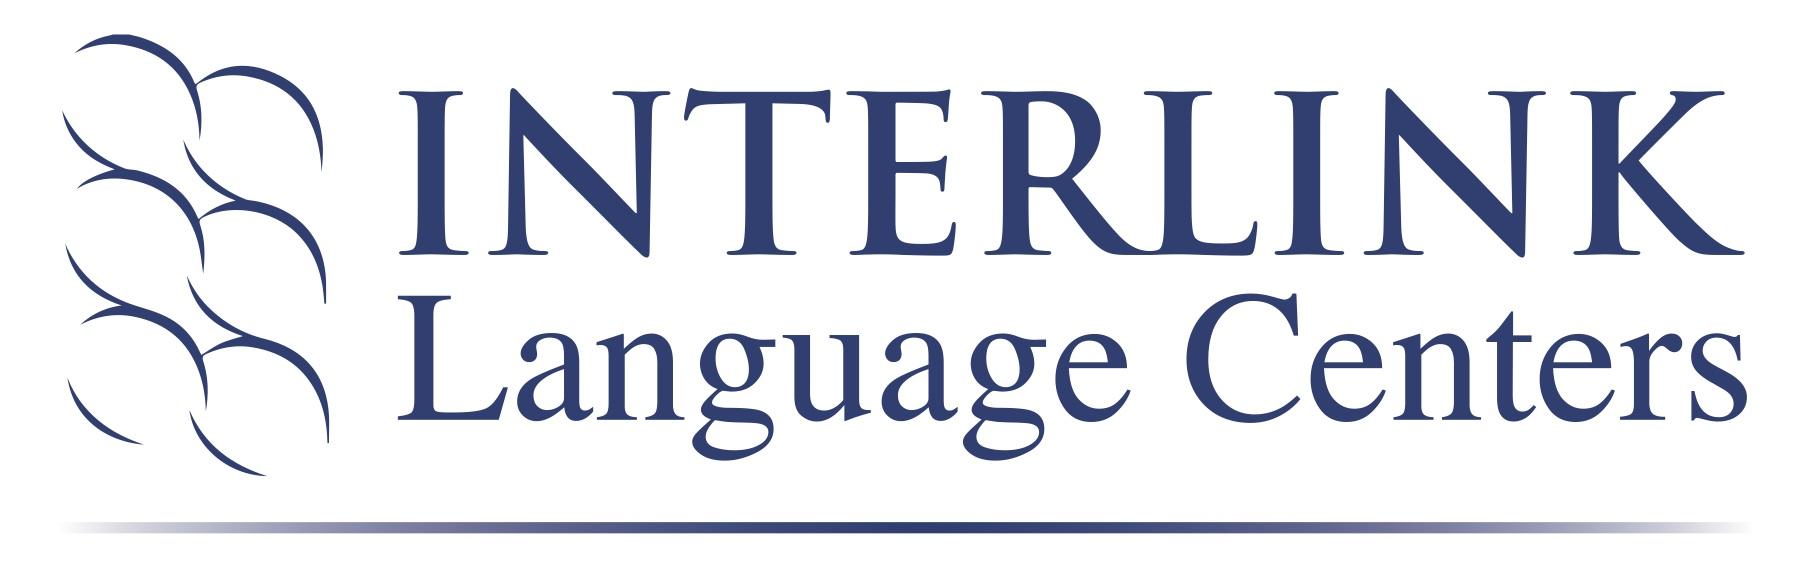 INTERLINK Language Centers